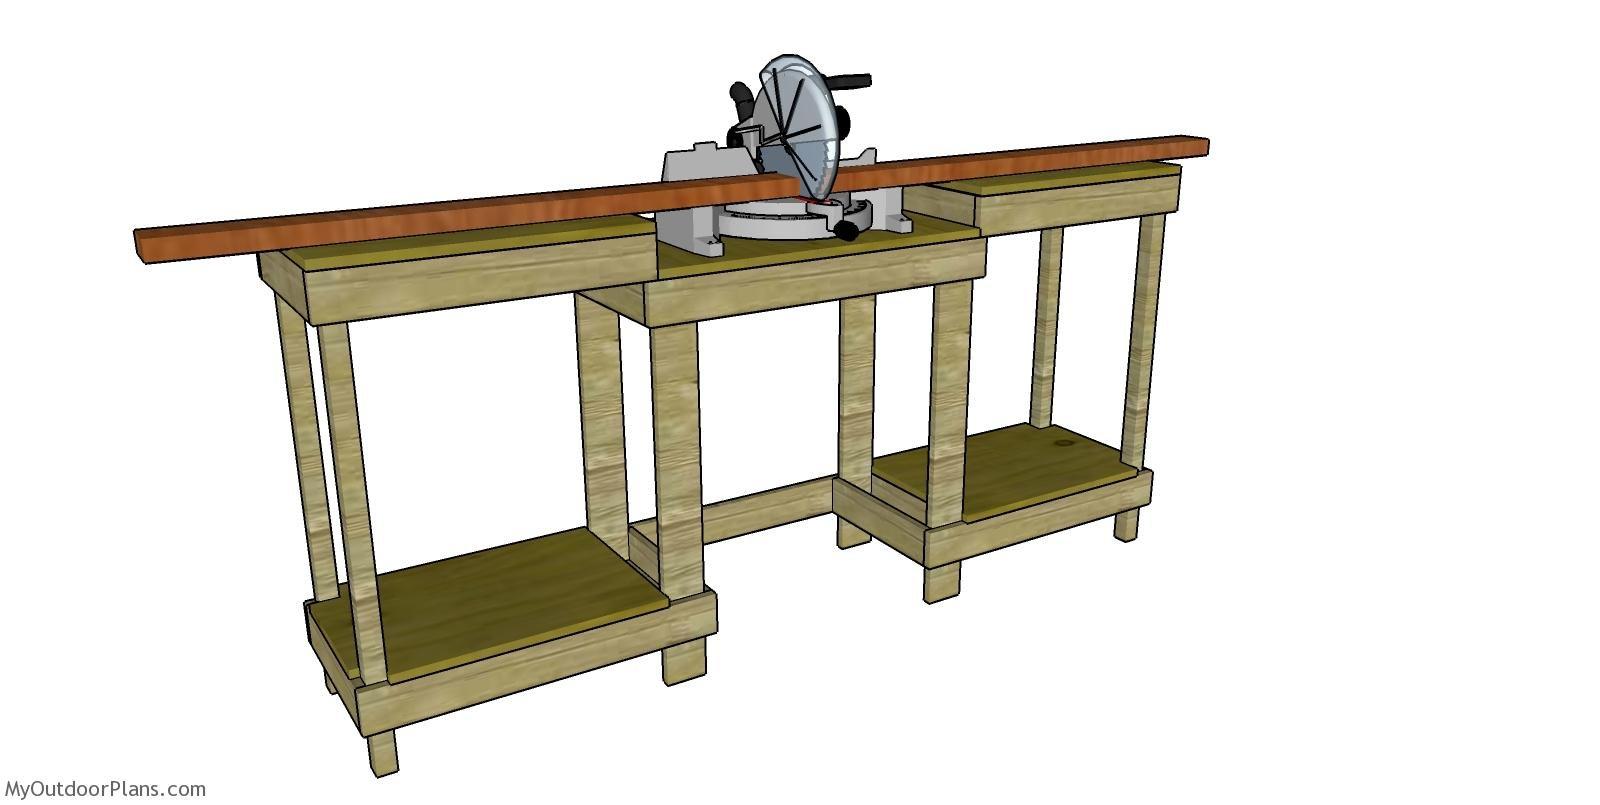 Simple Miter Saw Station - Free DIY Plans